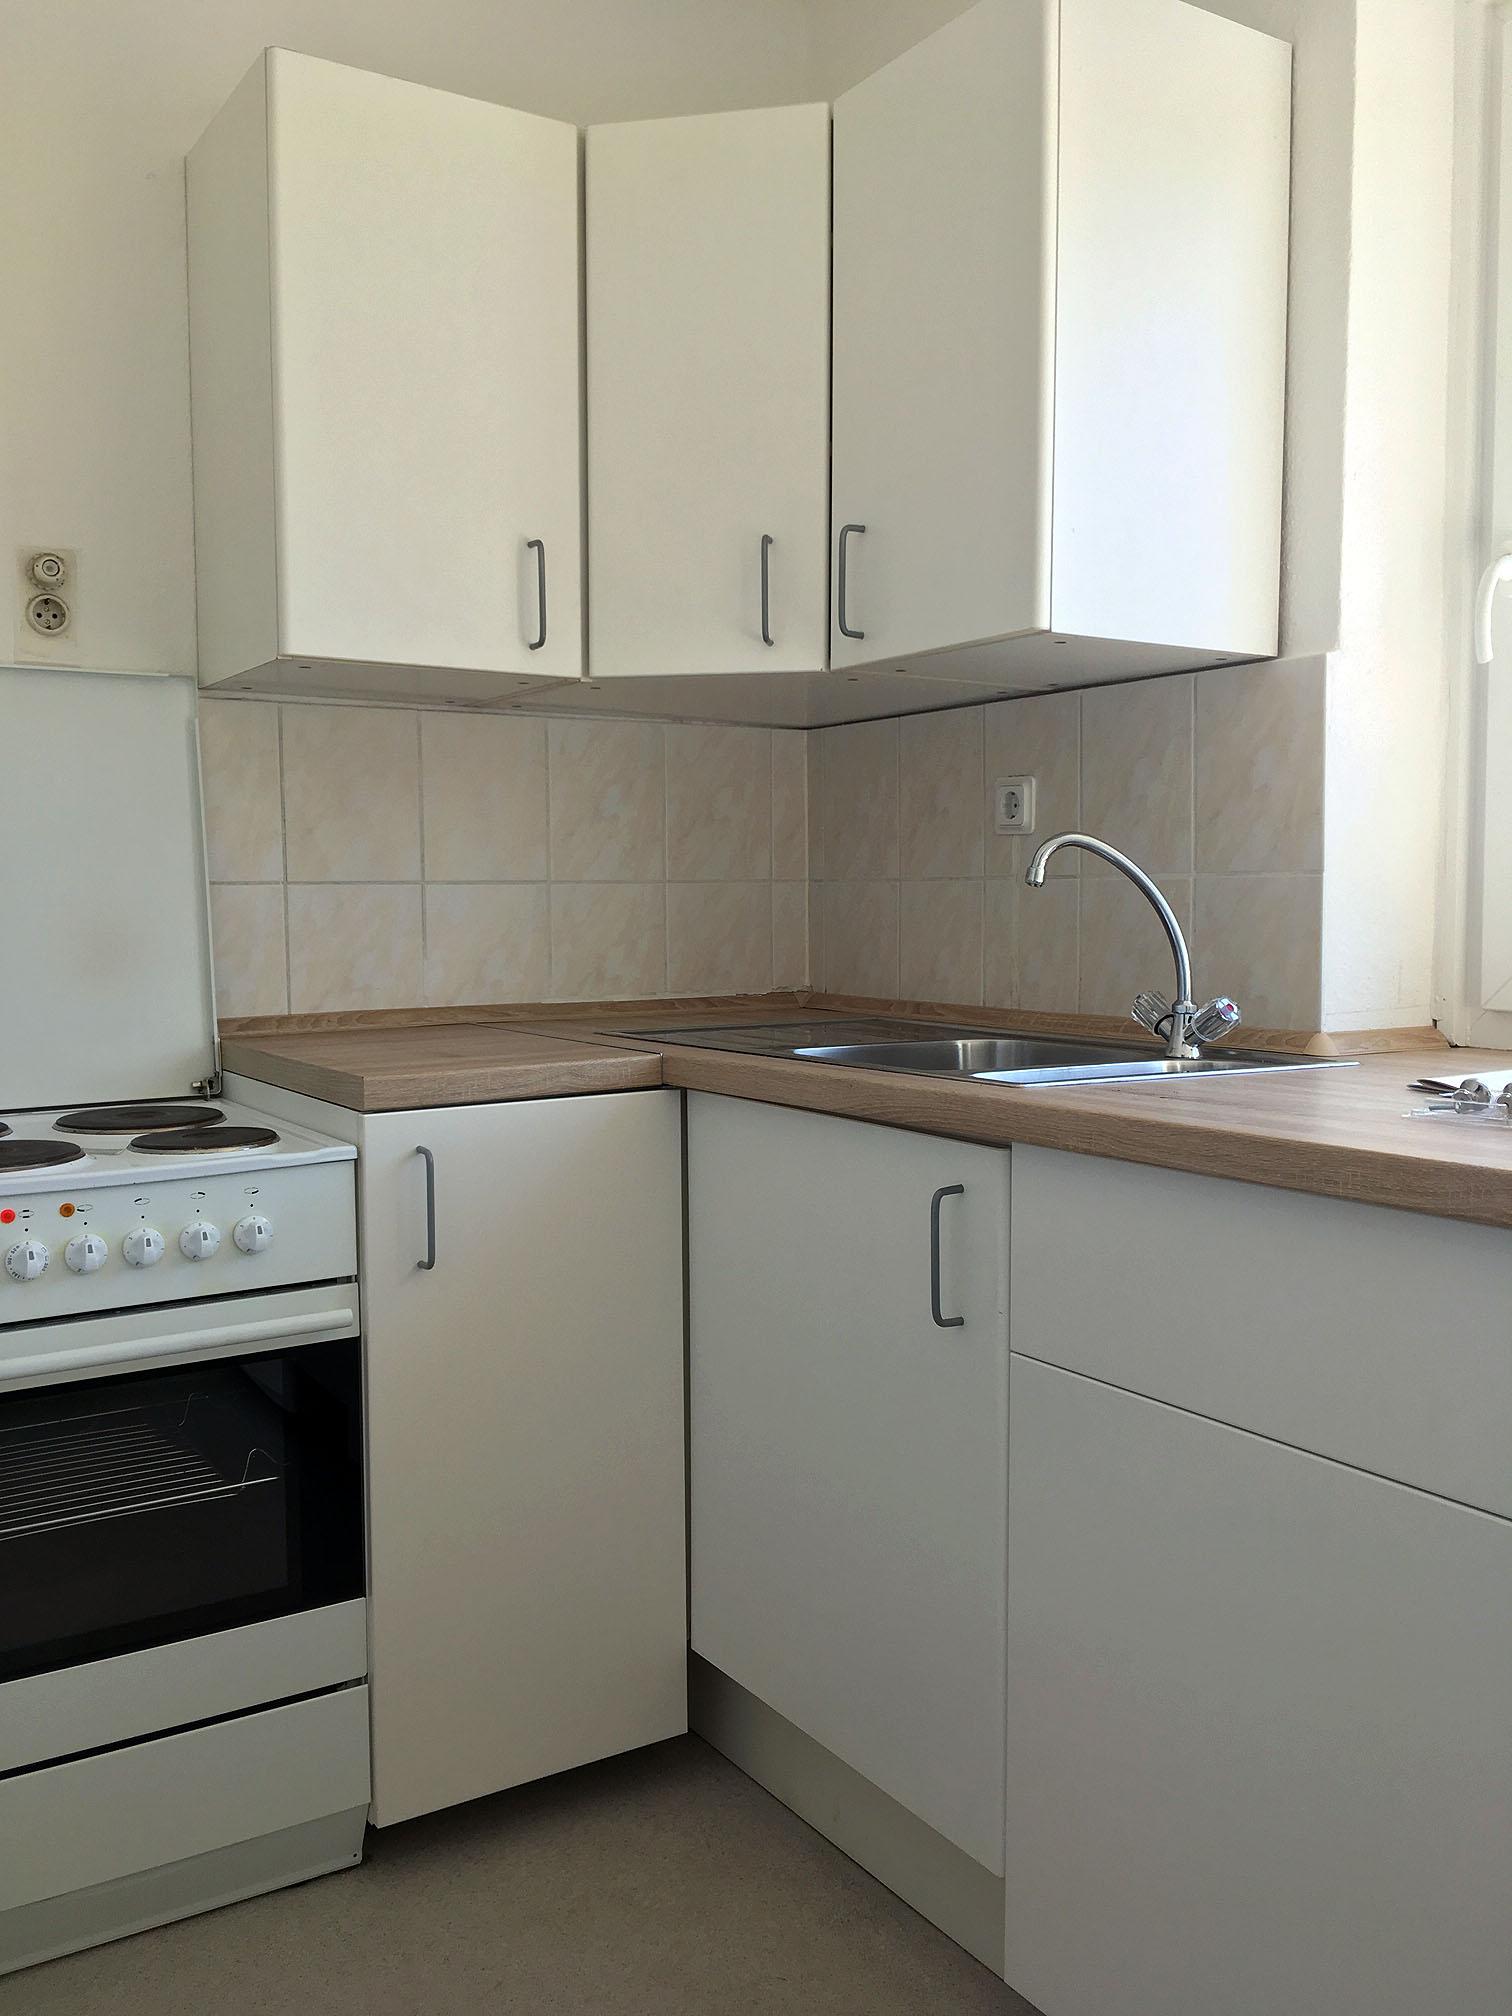 2 zimmerwohnung ber zwei ebenen balkon hamburg eppendorf witt immobilien. Black Bedroom Furniture Sets. Home Design Ideas